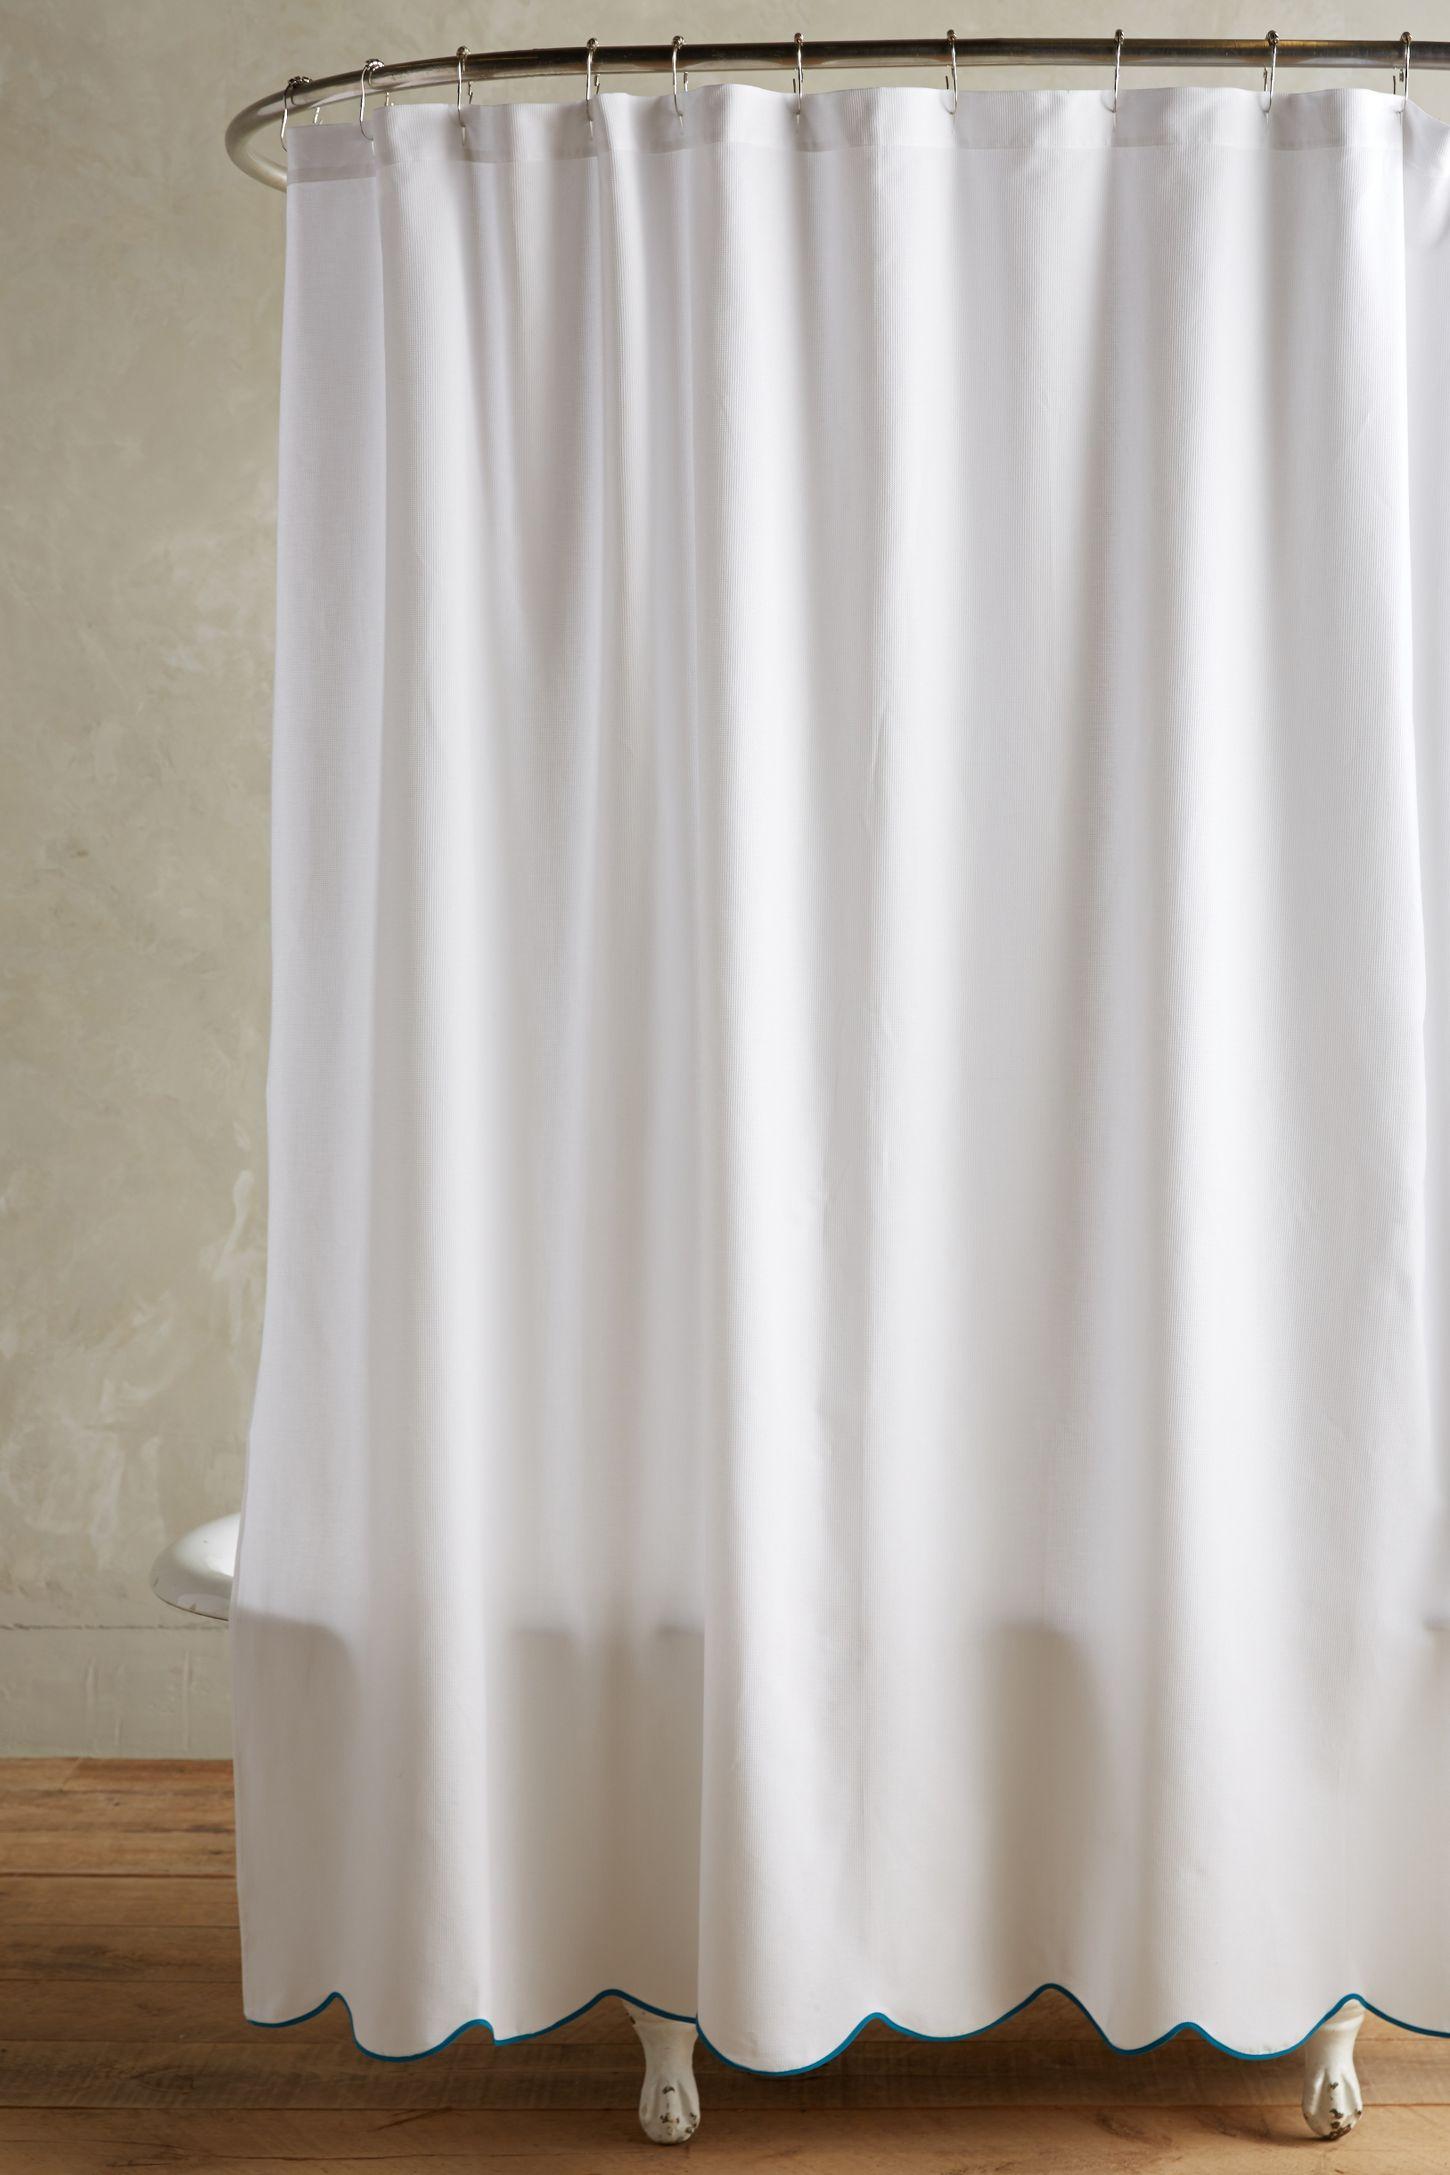 Anthropologie floral shower curtain - Anthropologie Floral Shower Curtain 42